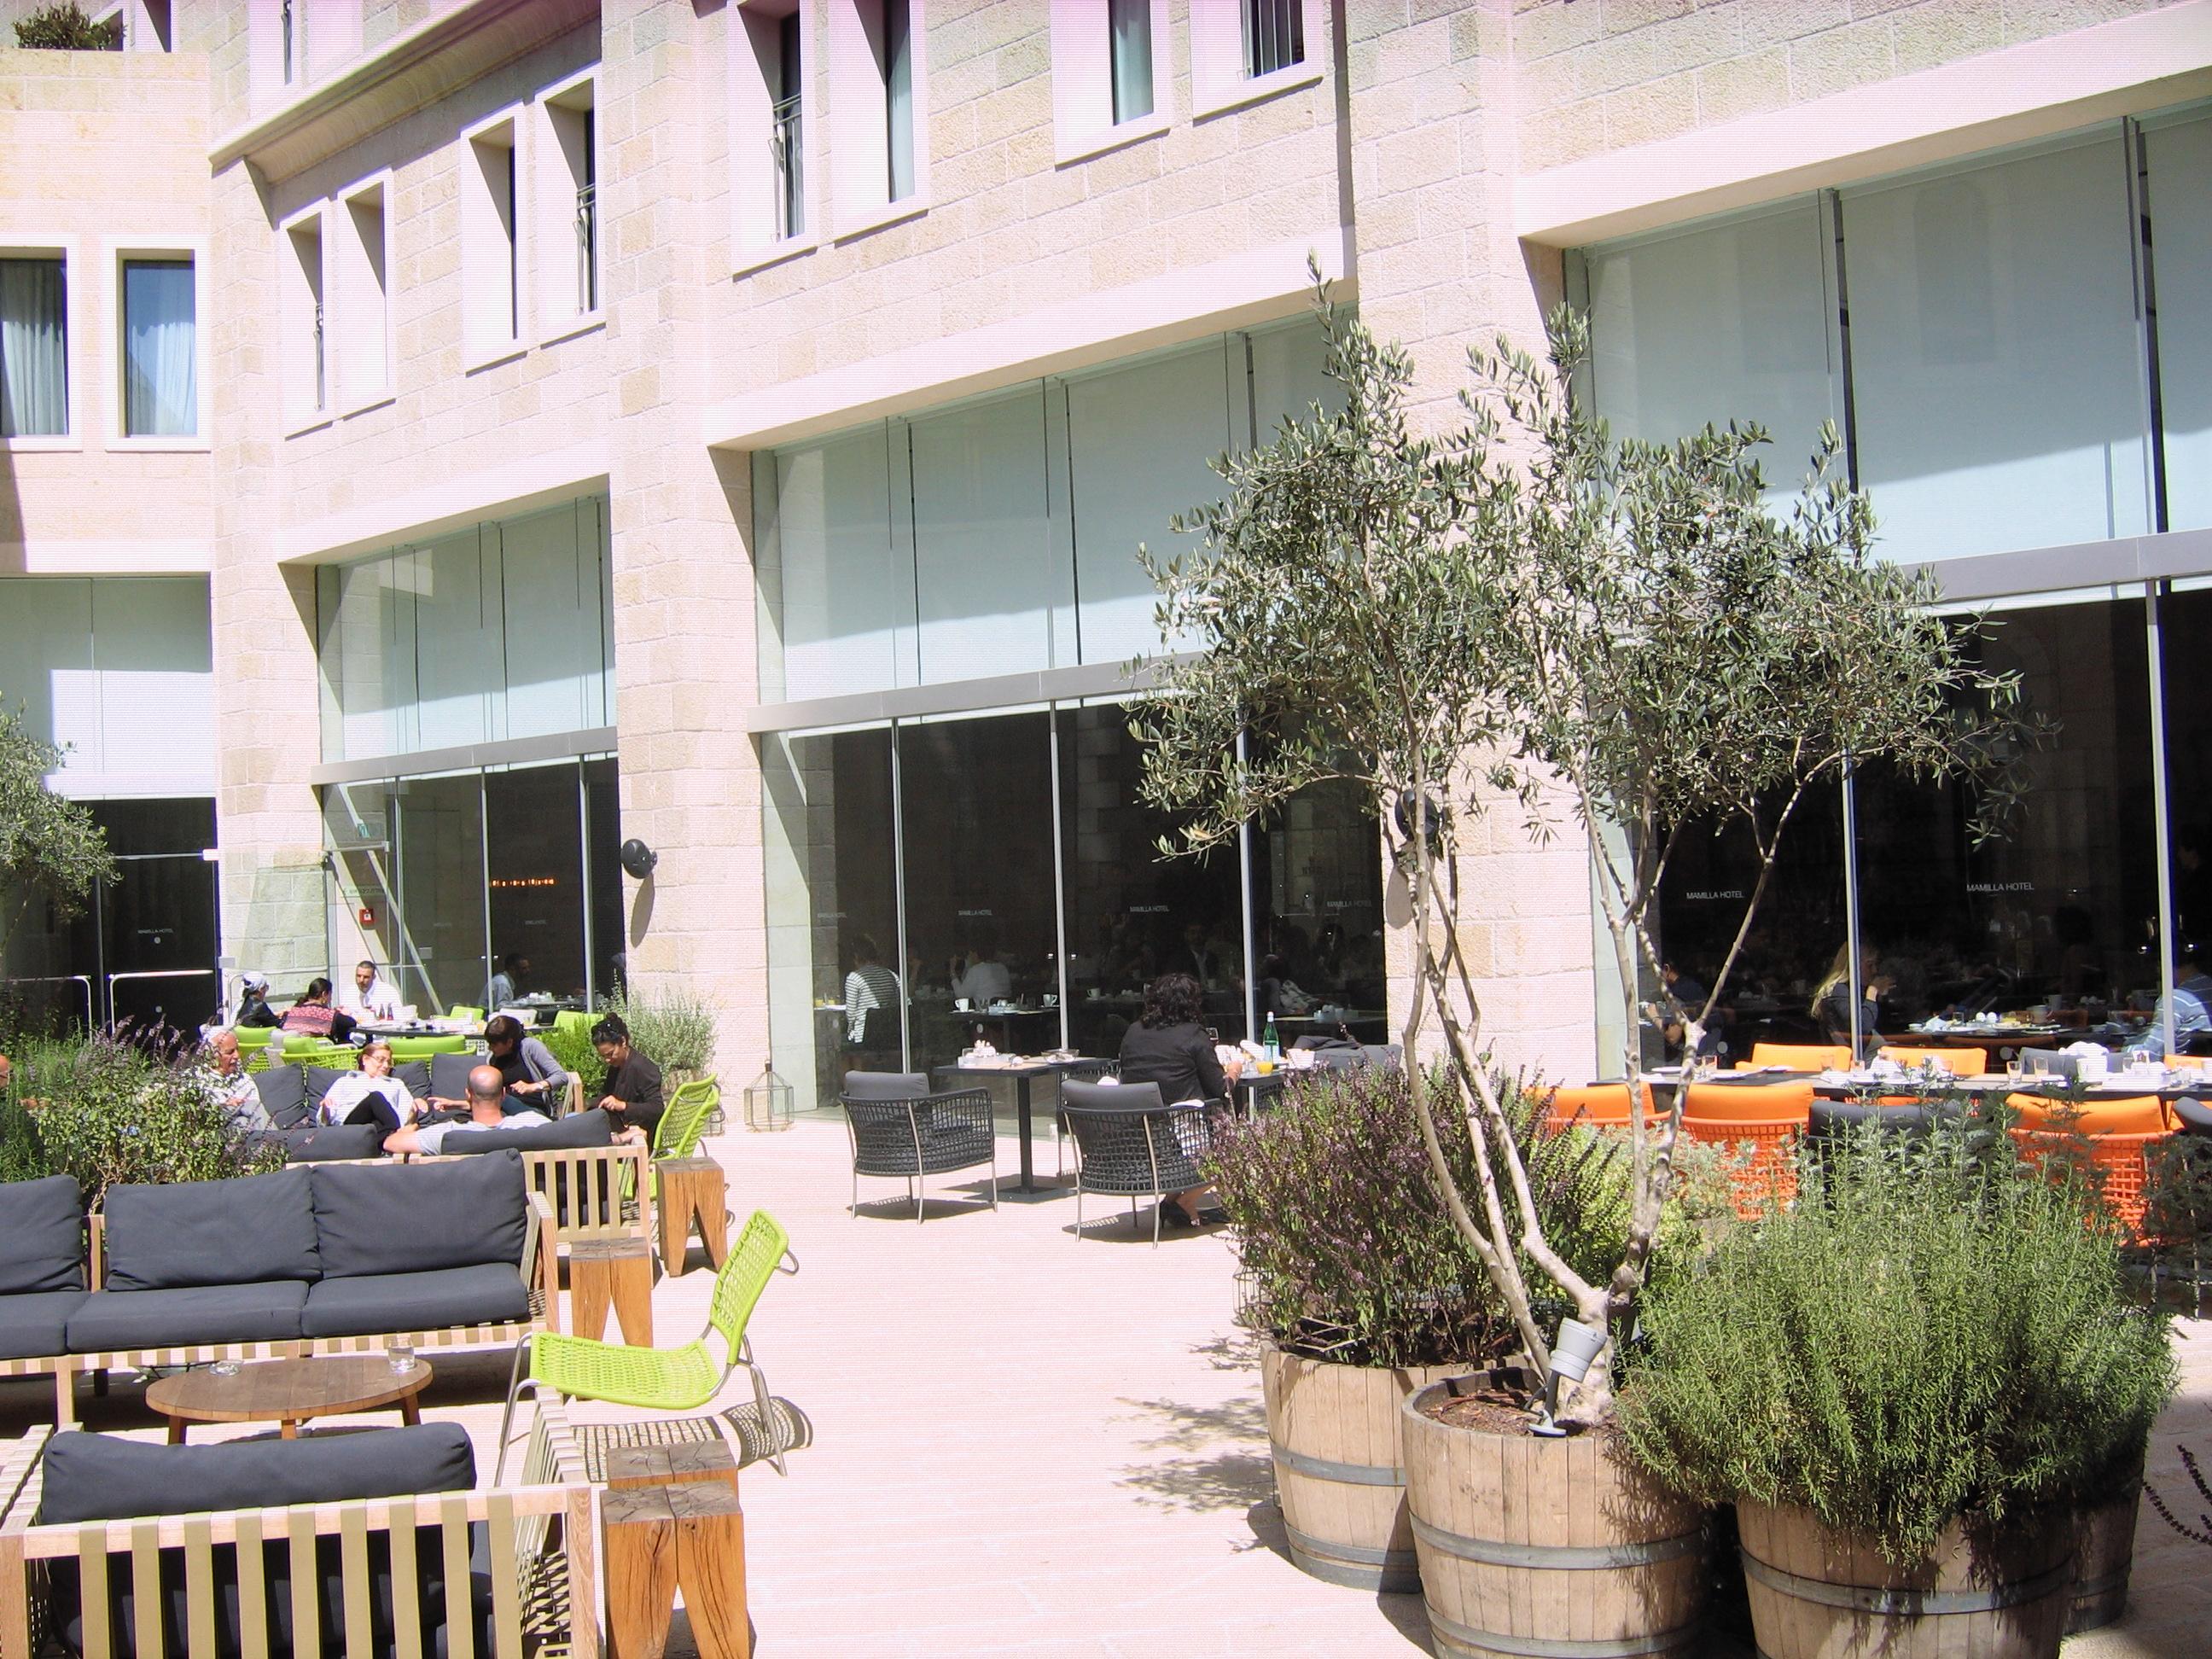 Mamilla hotel view 1.JPG